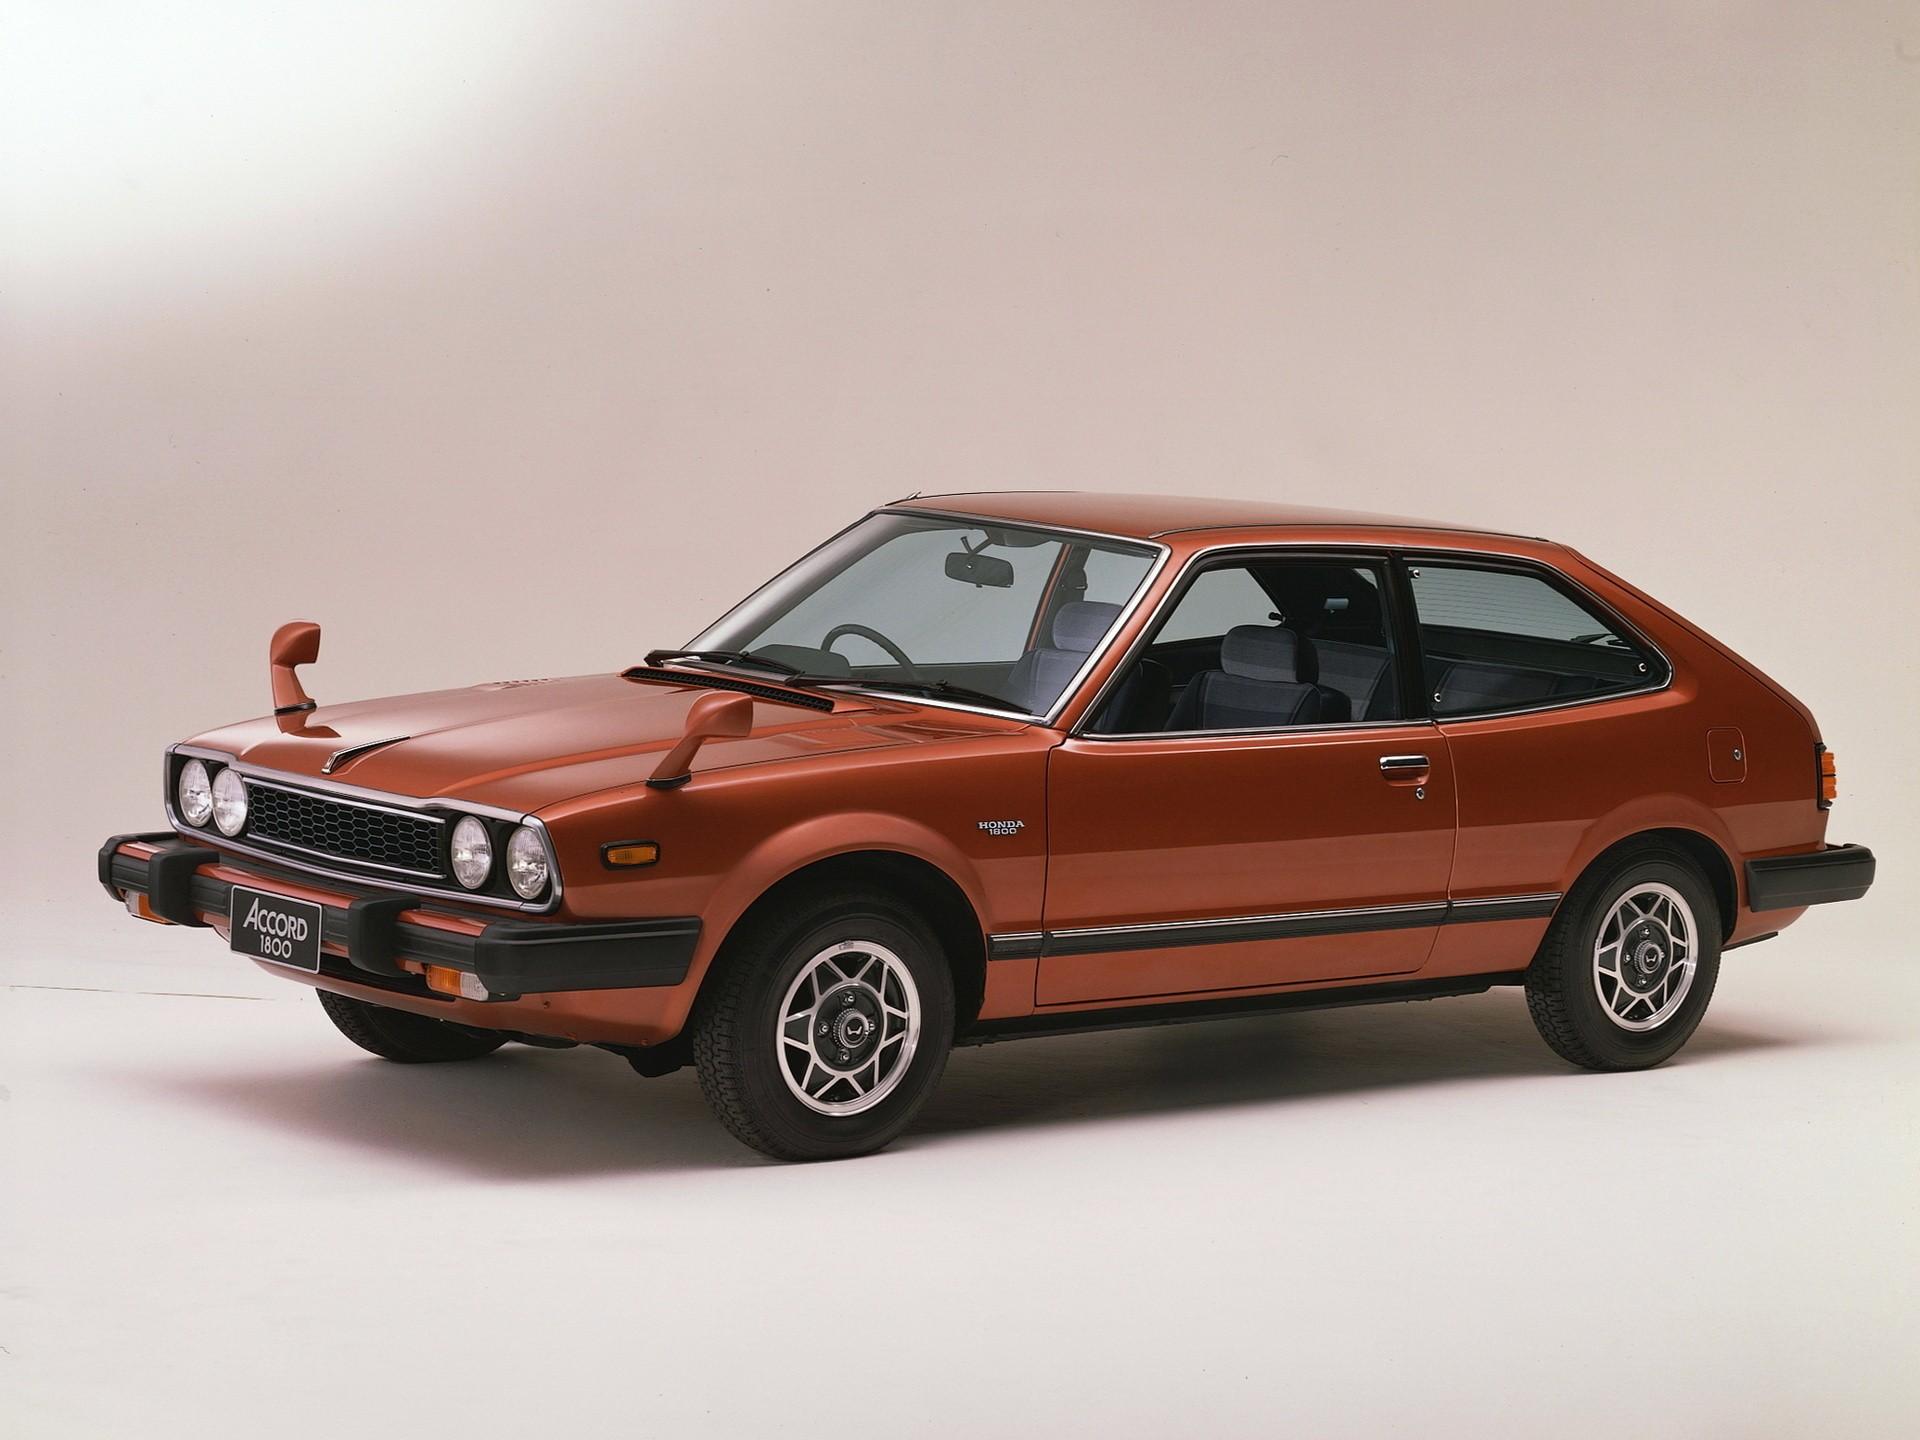 Honda Accord I 1976 - 1981 Hatchback 3 door #6